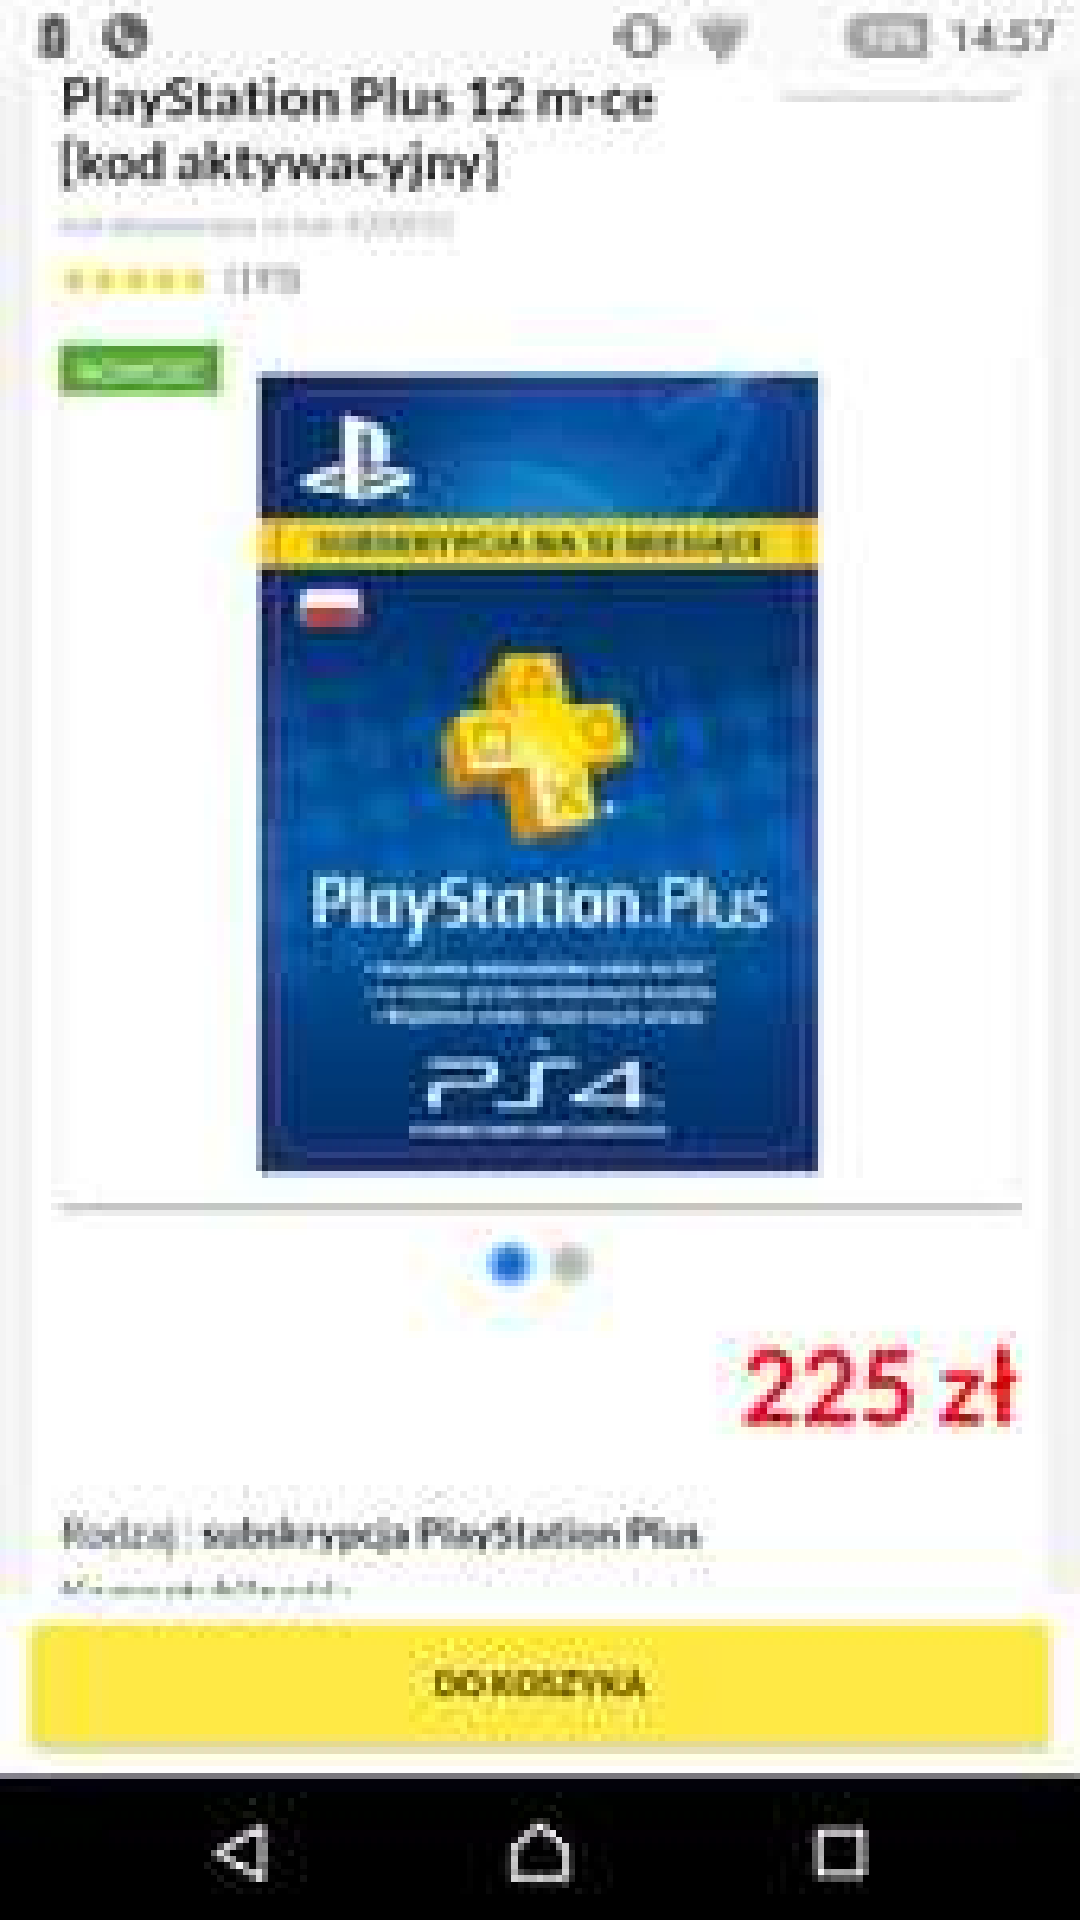 Play Station plus Rtv Euro Agd 225 zł